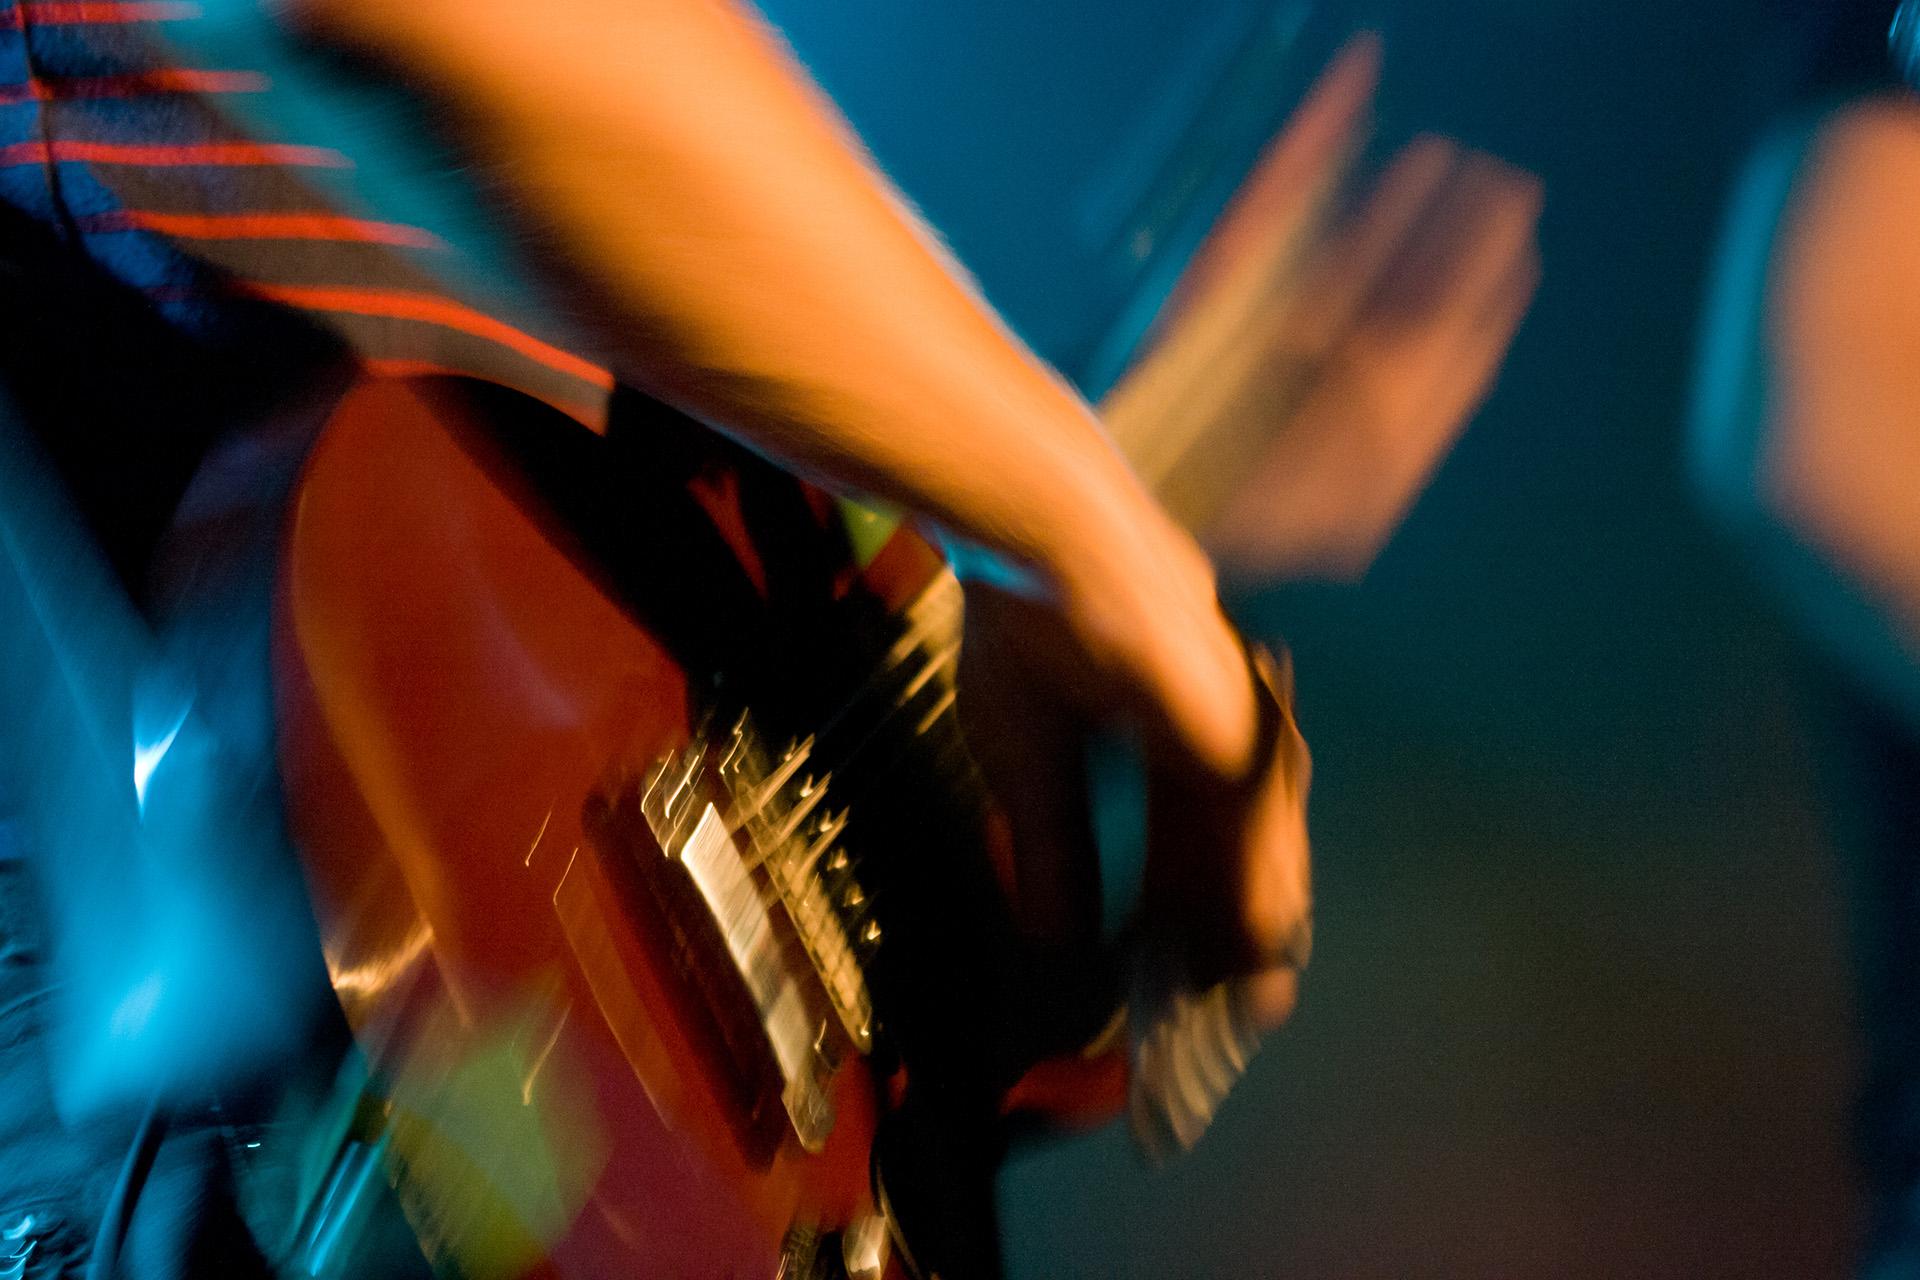 A guitarist plays his guitar in Melbourne, Australia